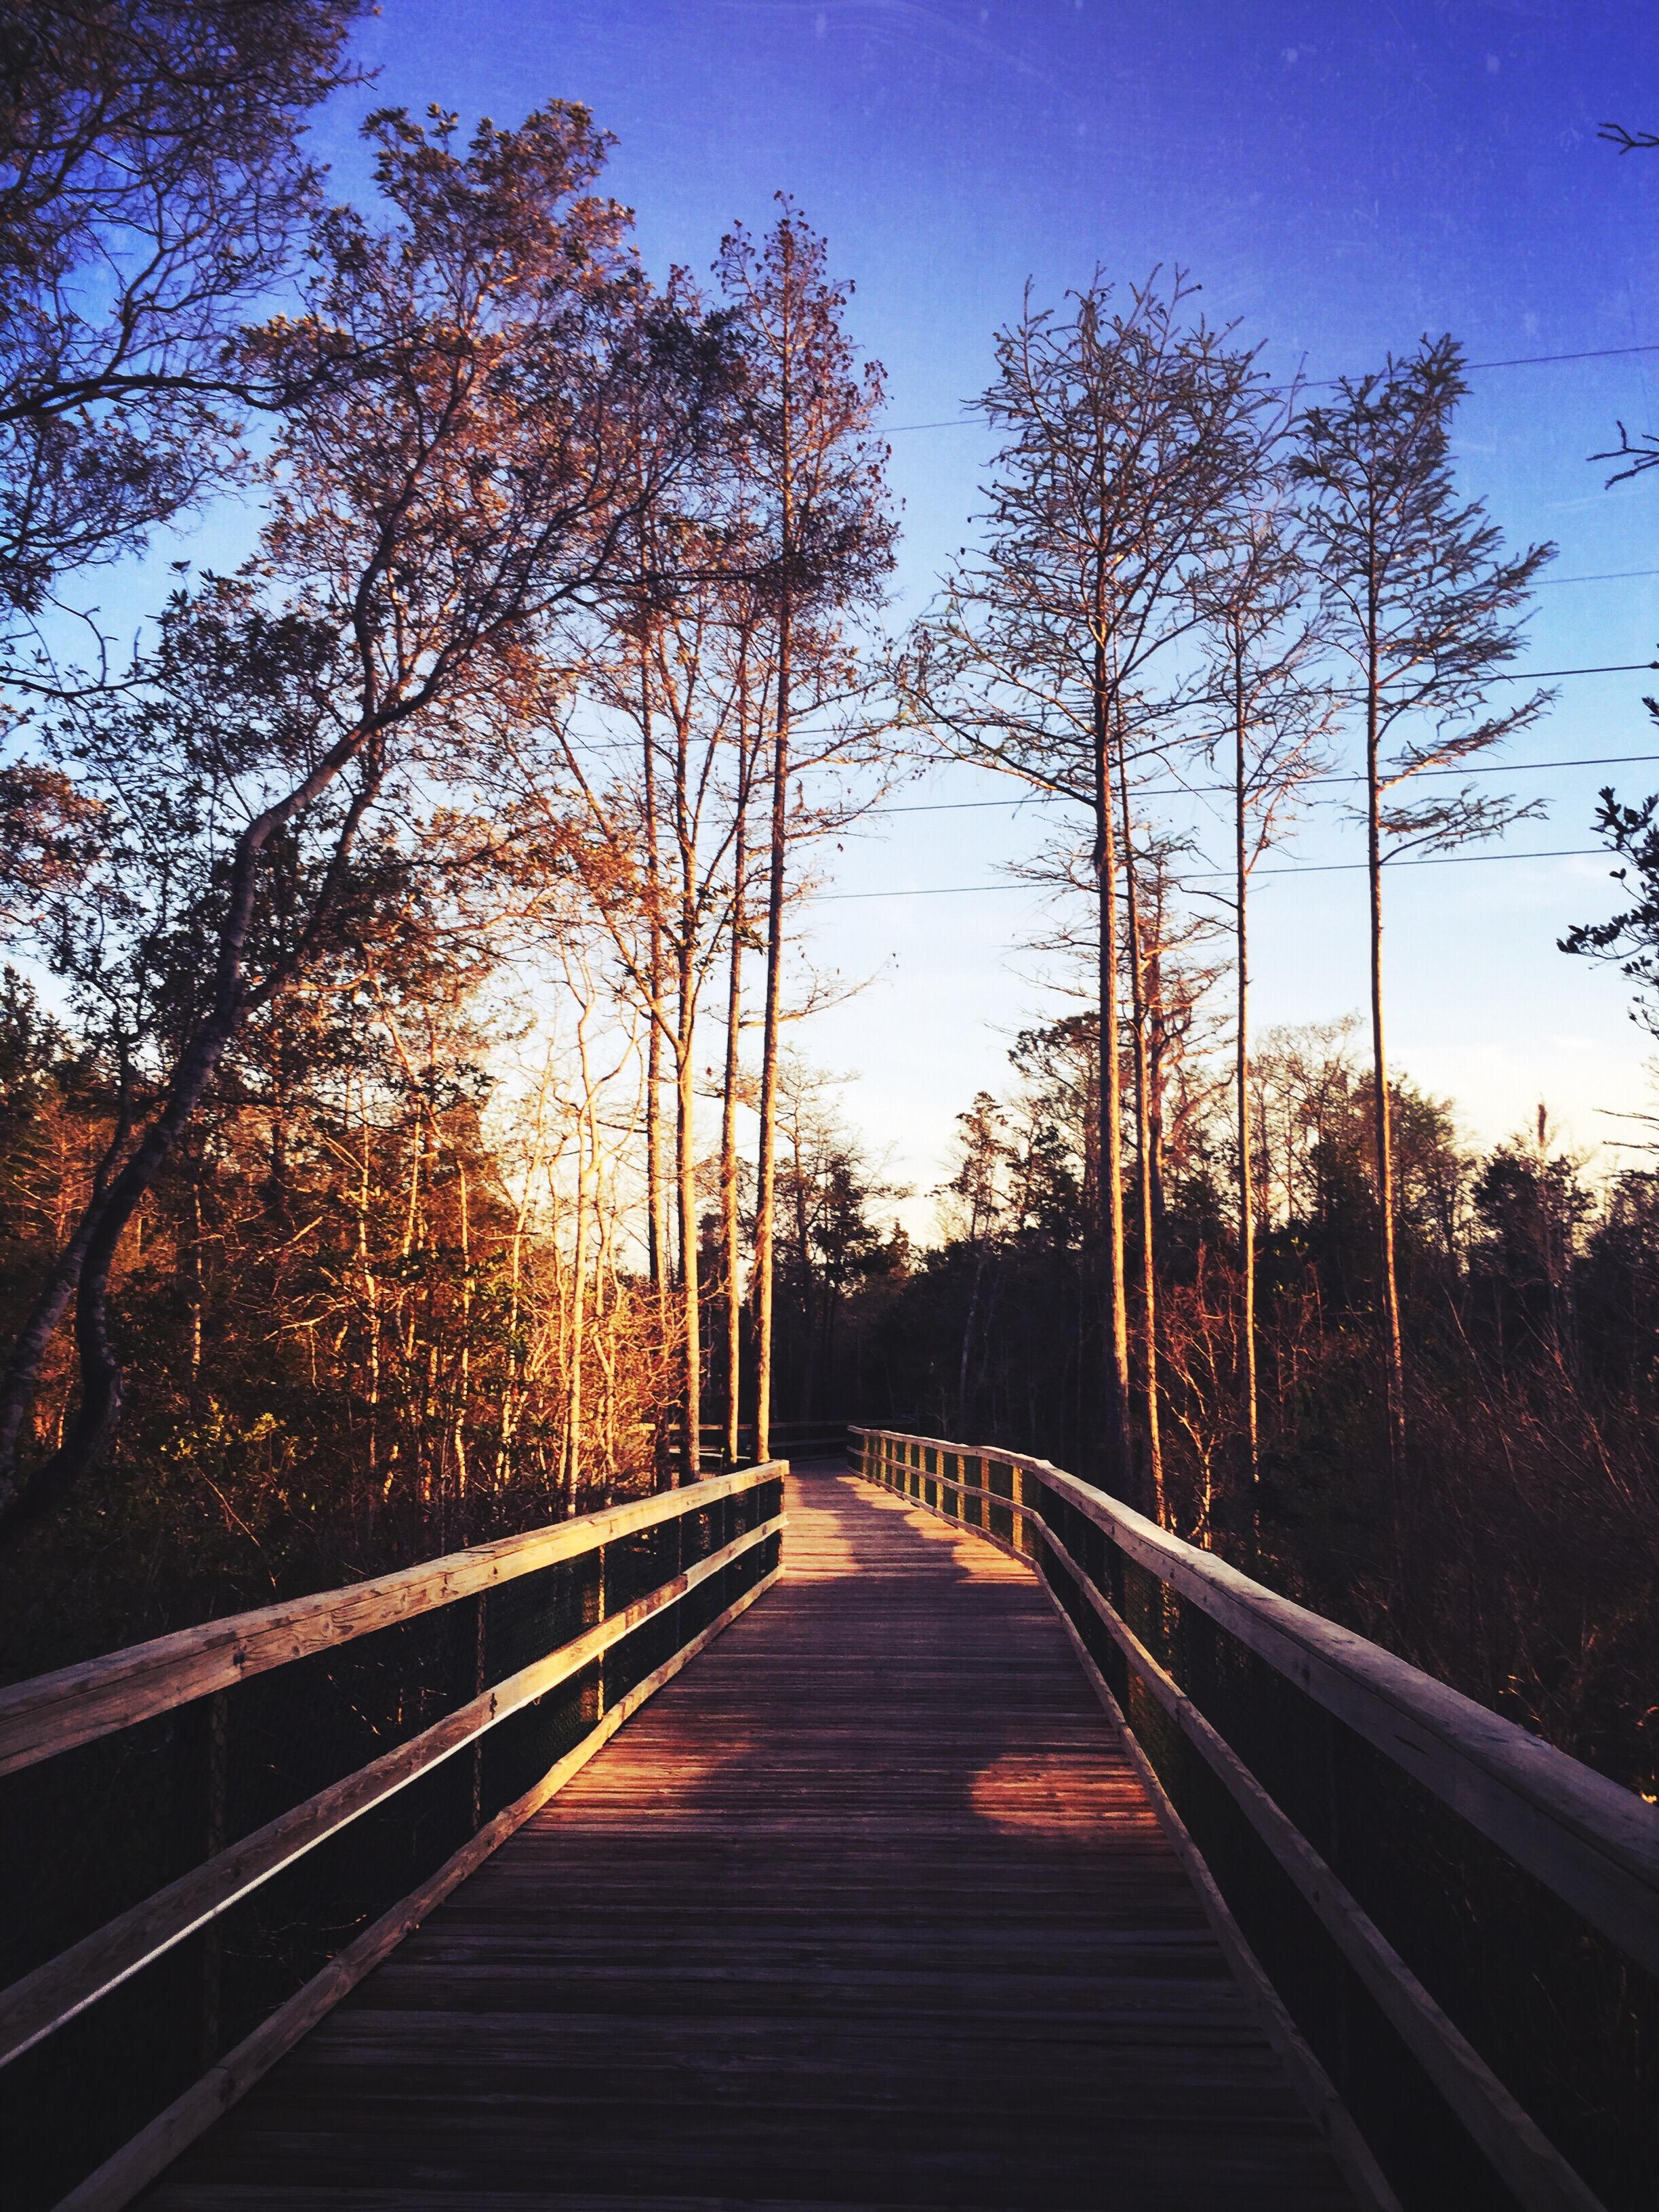 sunset-in-niceville-trees-beautiful-florida